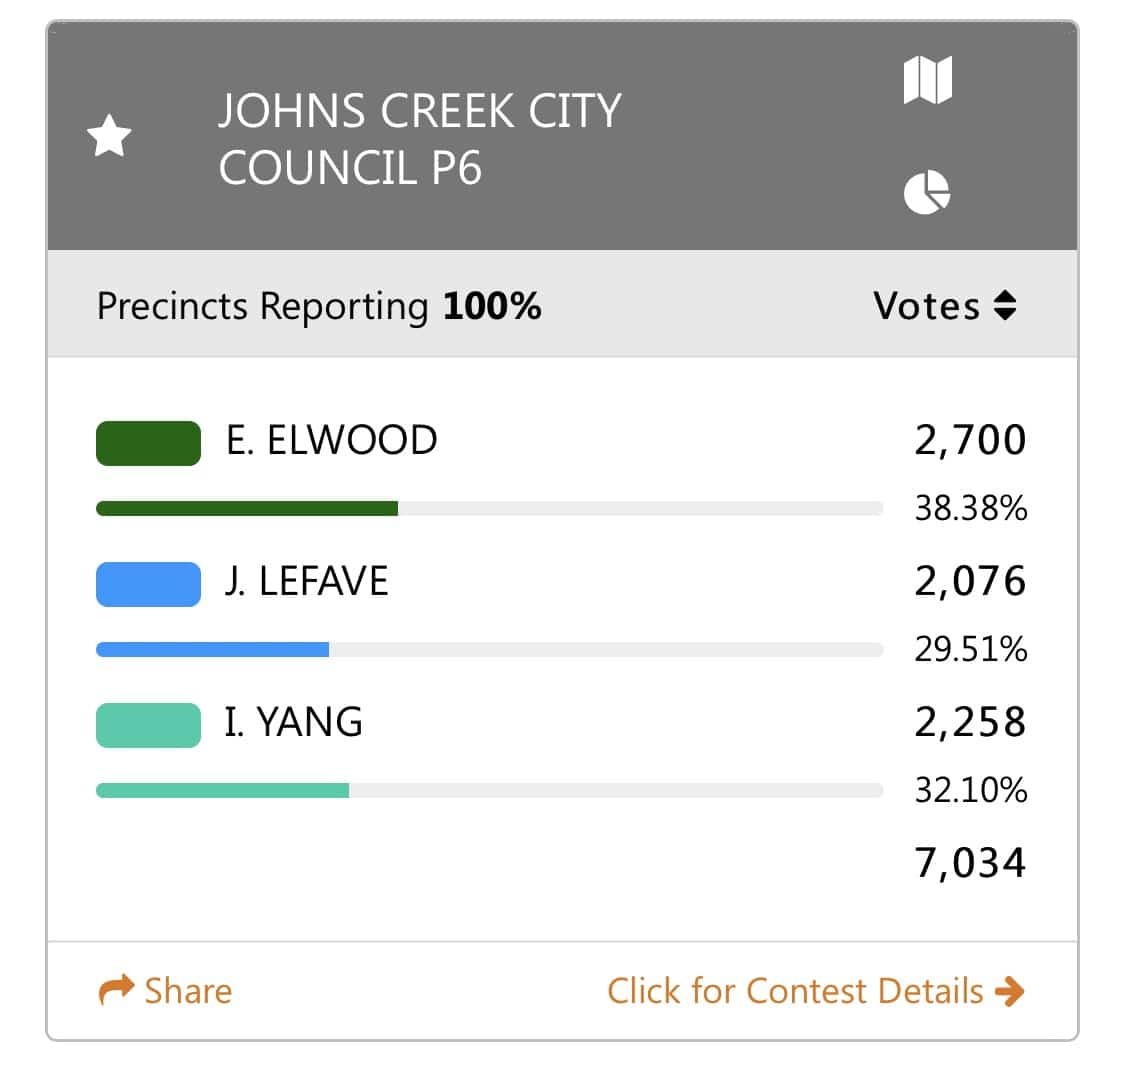 Johns Creek City Council Post 6 Results